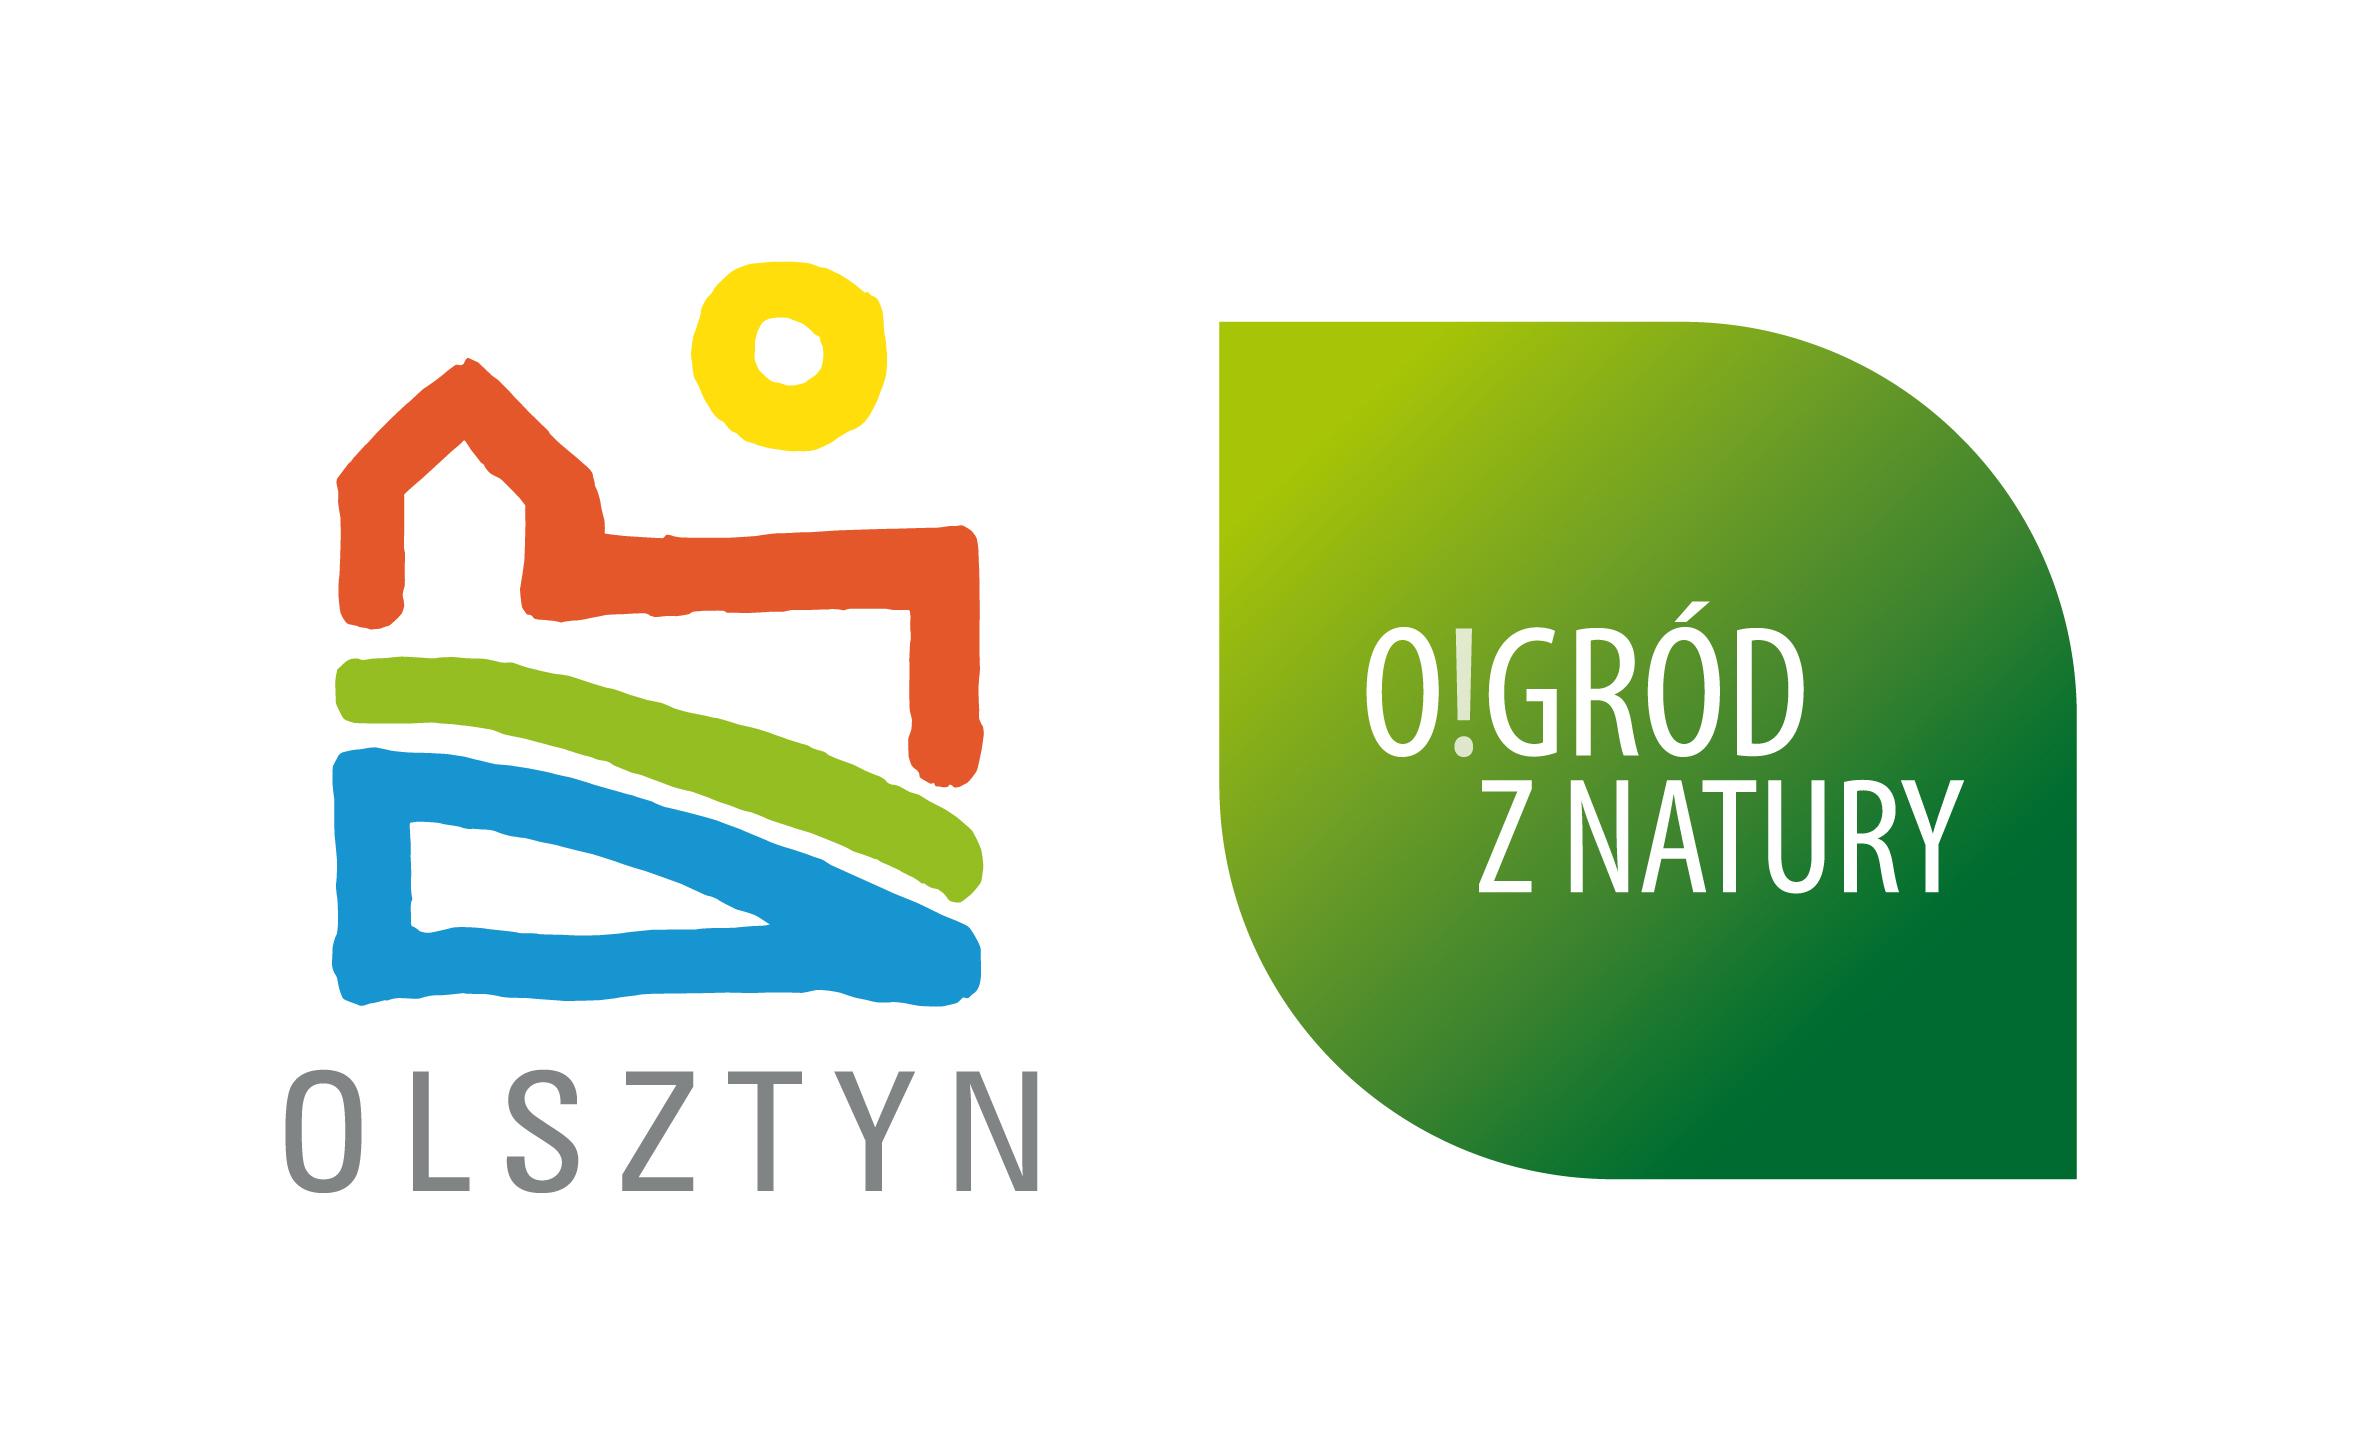 http://m.wm.pl/2017/03/orig/logo-z-listkiem-376182.jpg